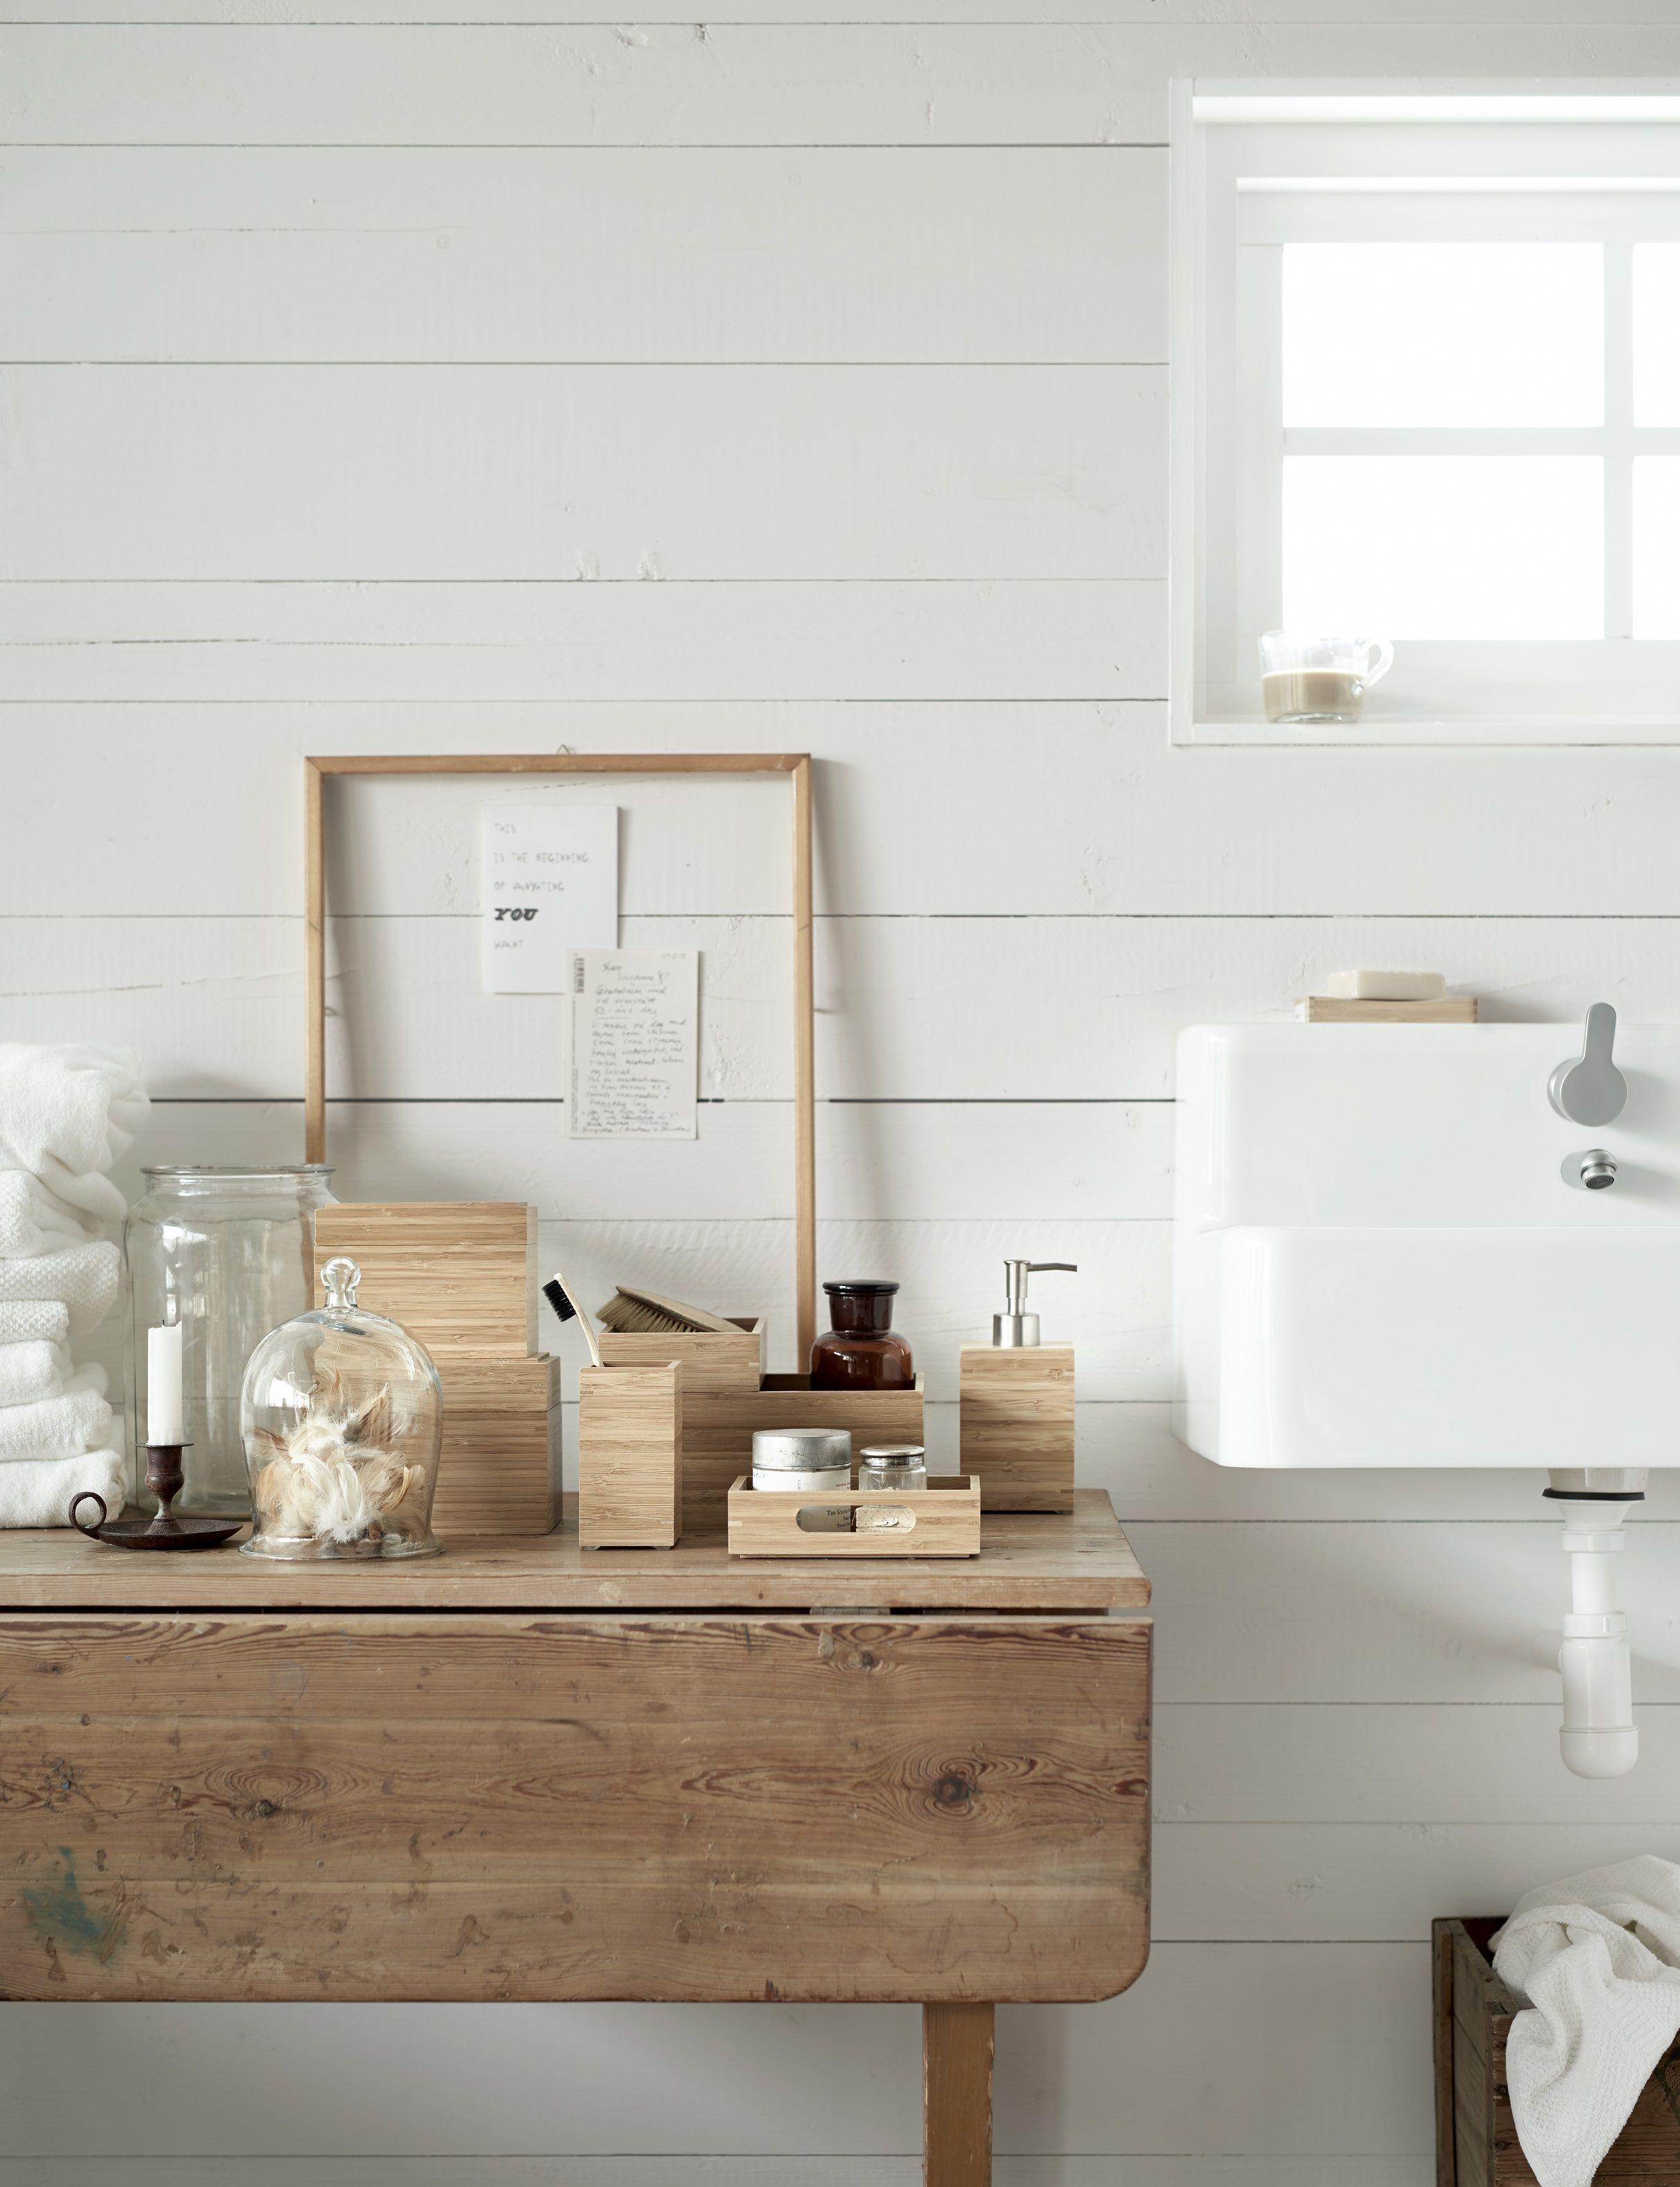 DRAGAN collectie | #IKEA #IKEAnl #badkamer #accessoires #bamboe #du ...